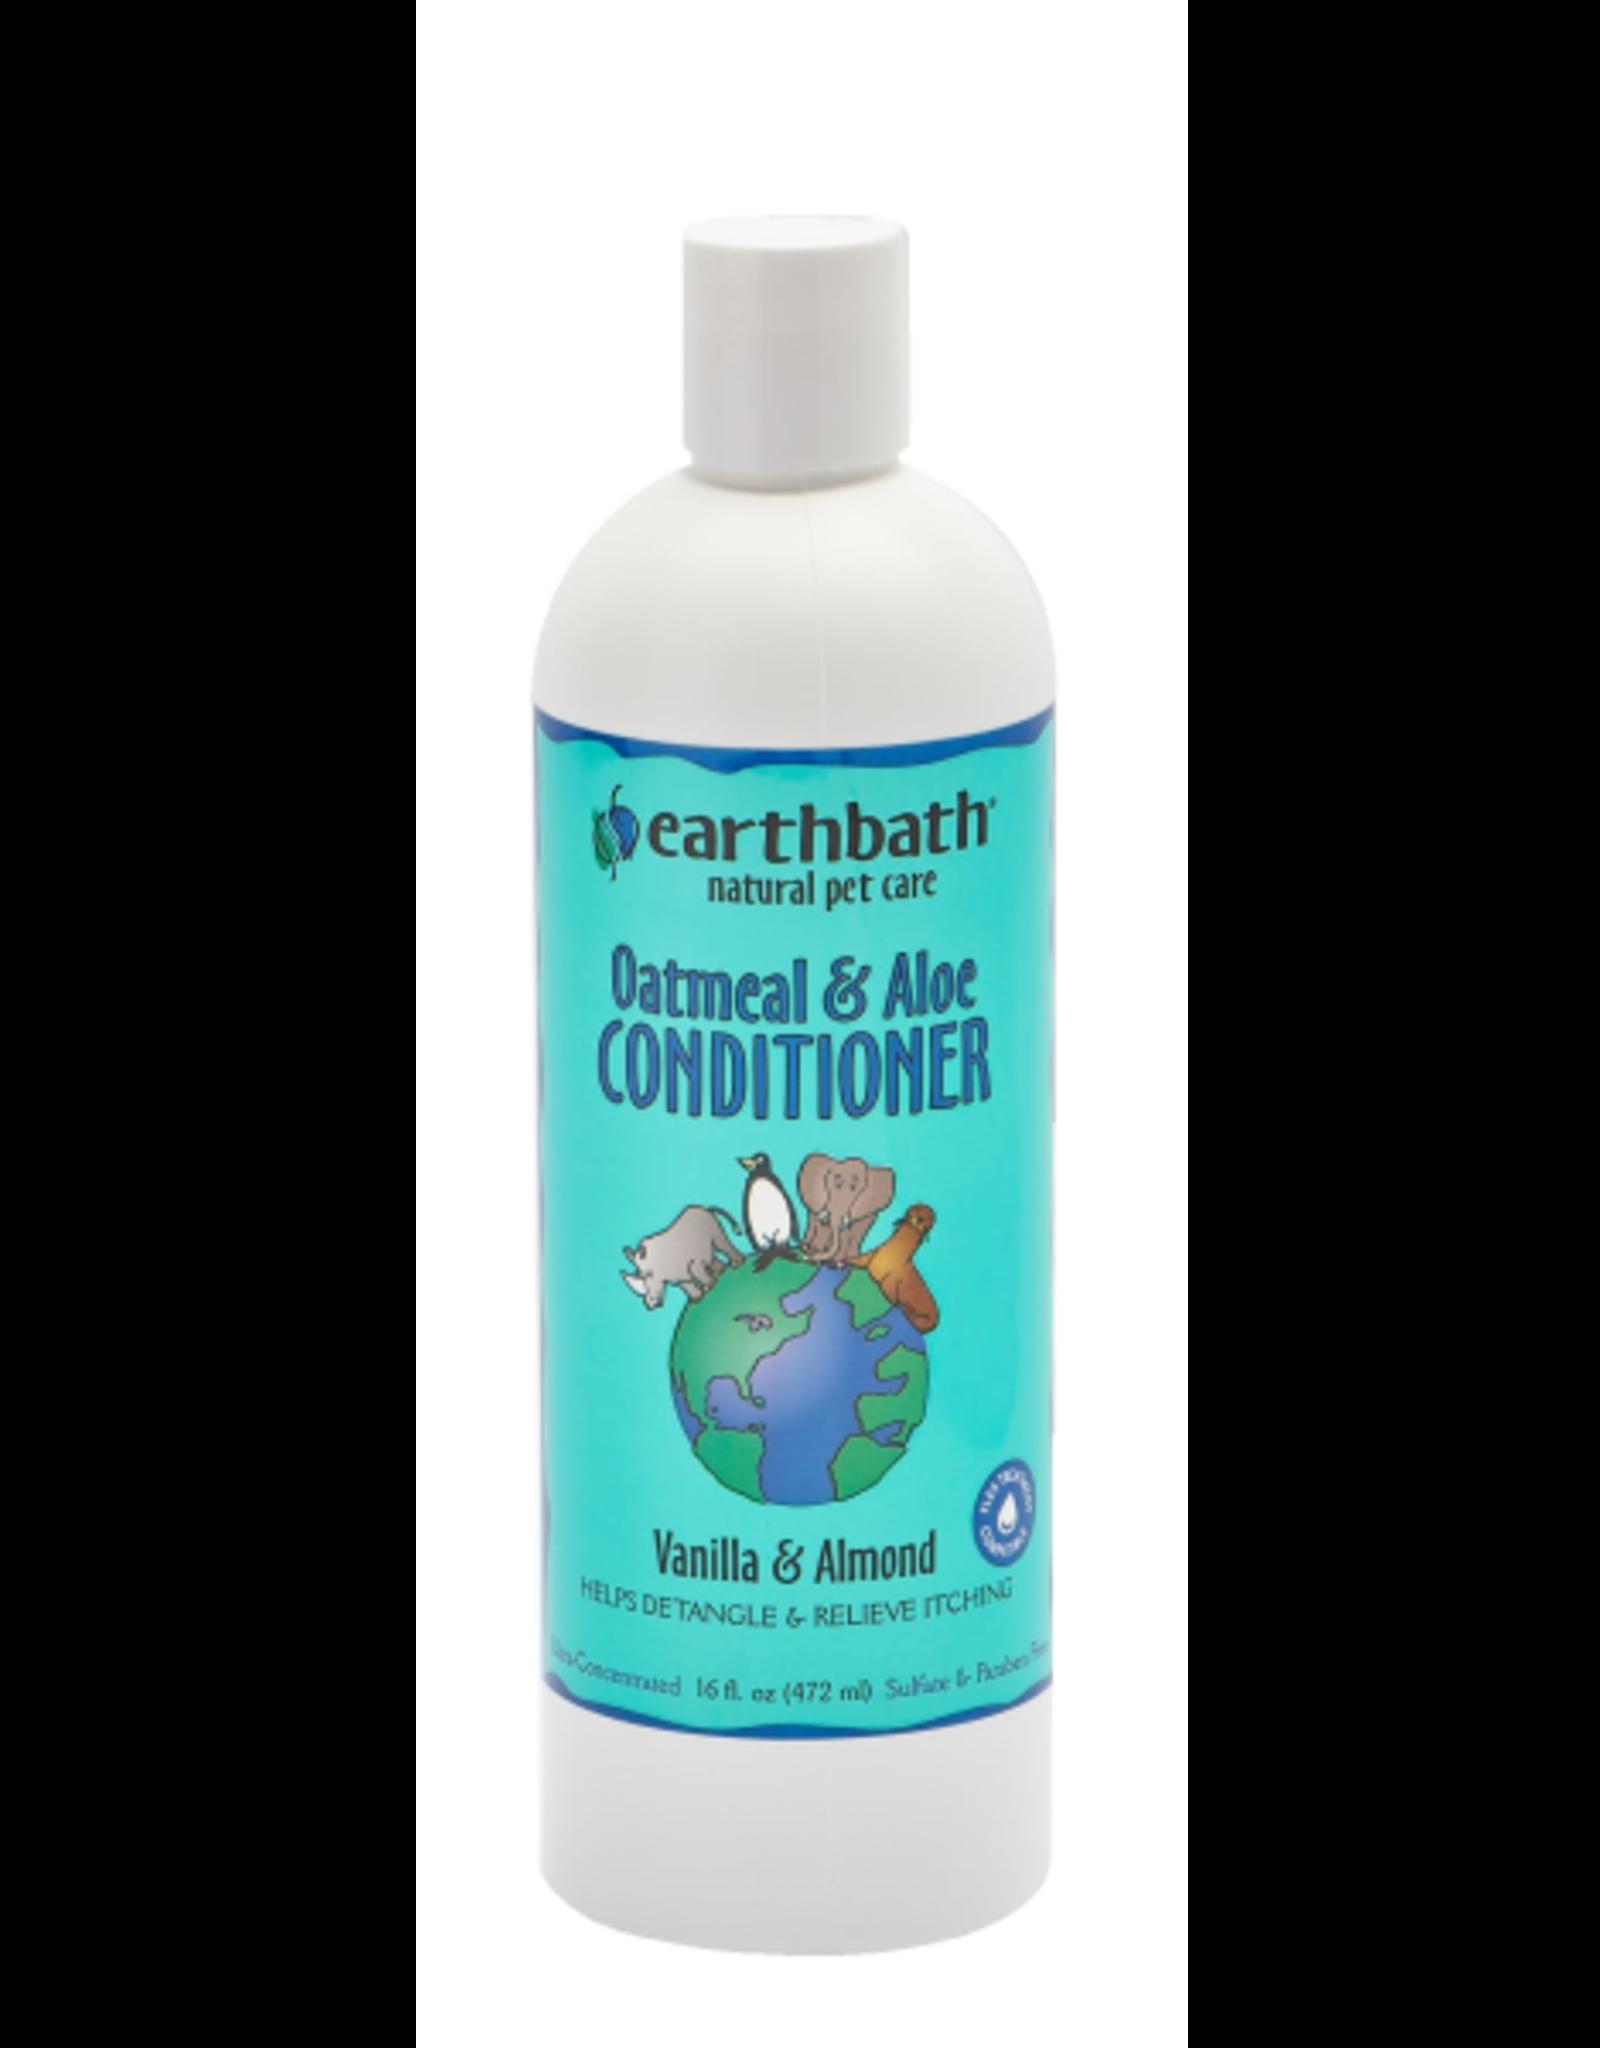 EARTH BATH earthbath Oatmeal&Aloe Conditioner Vanilla & Almond 16 oz